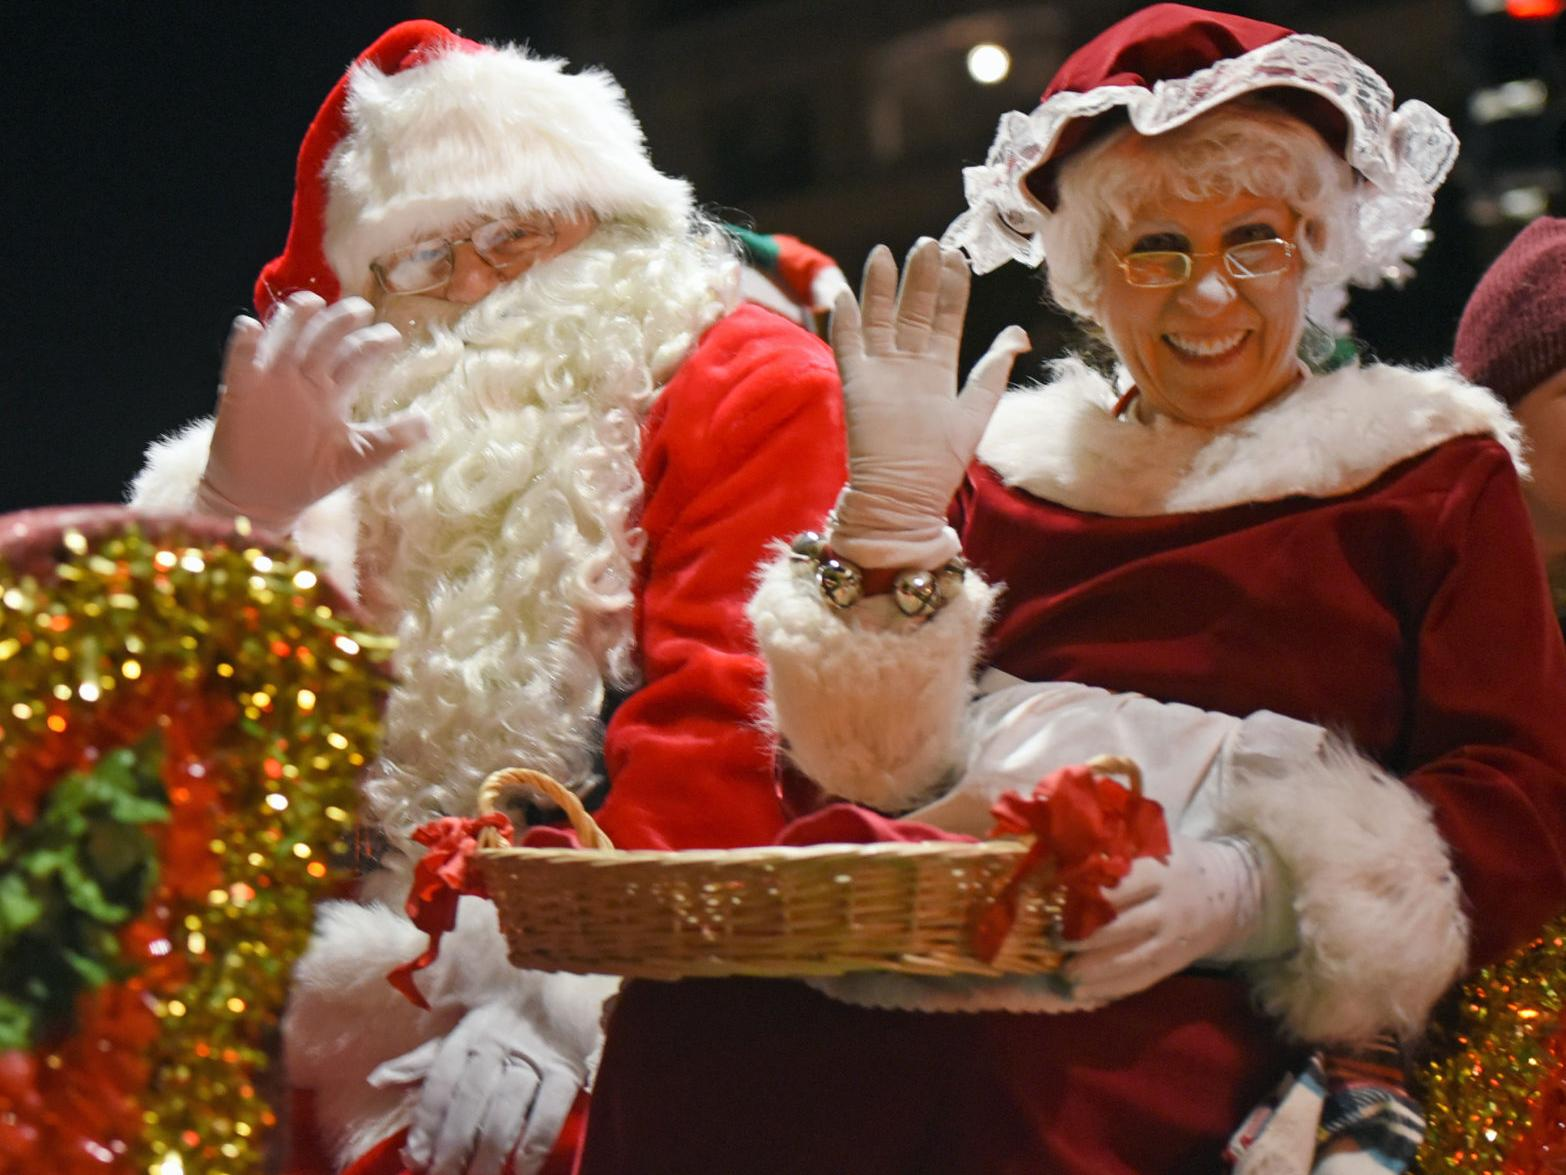 Salem Mo Christmas Parade 2021 Winston Salem Jaycees To Hold Reverse Holiday Parade On Saturday Local News Journalnow Com